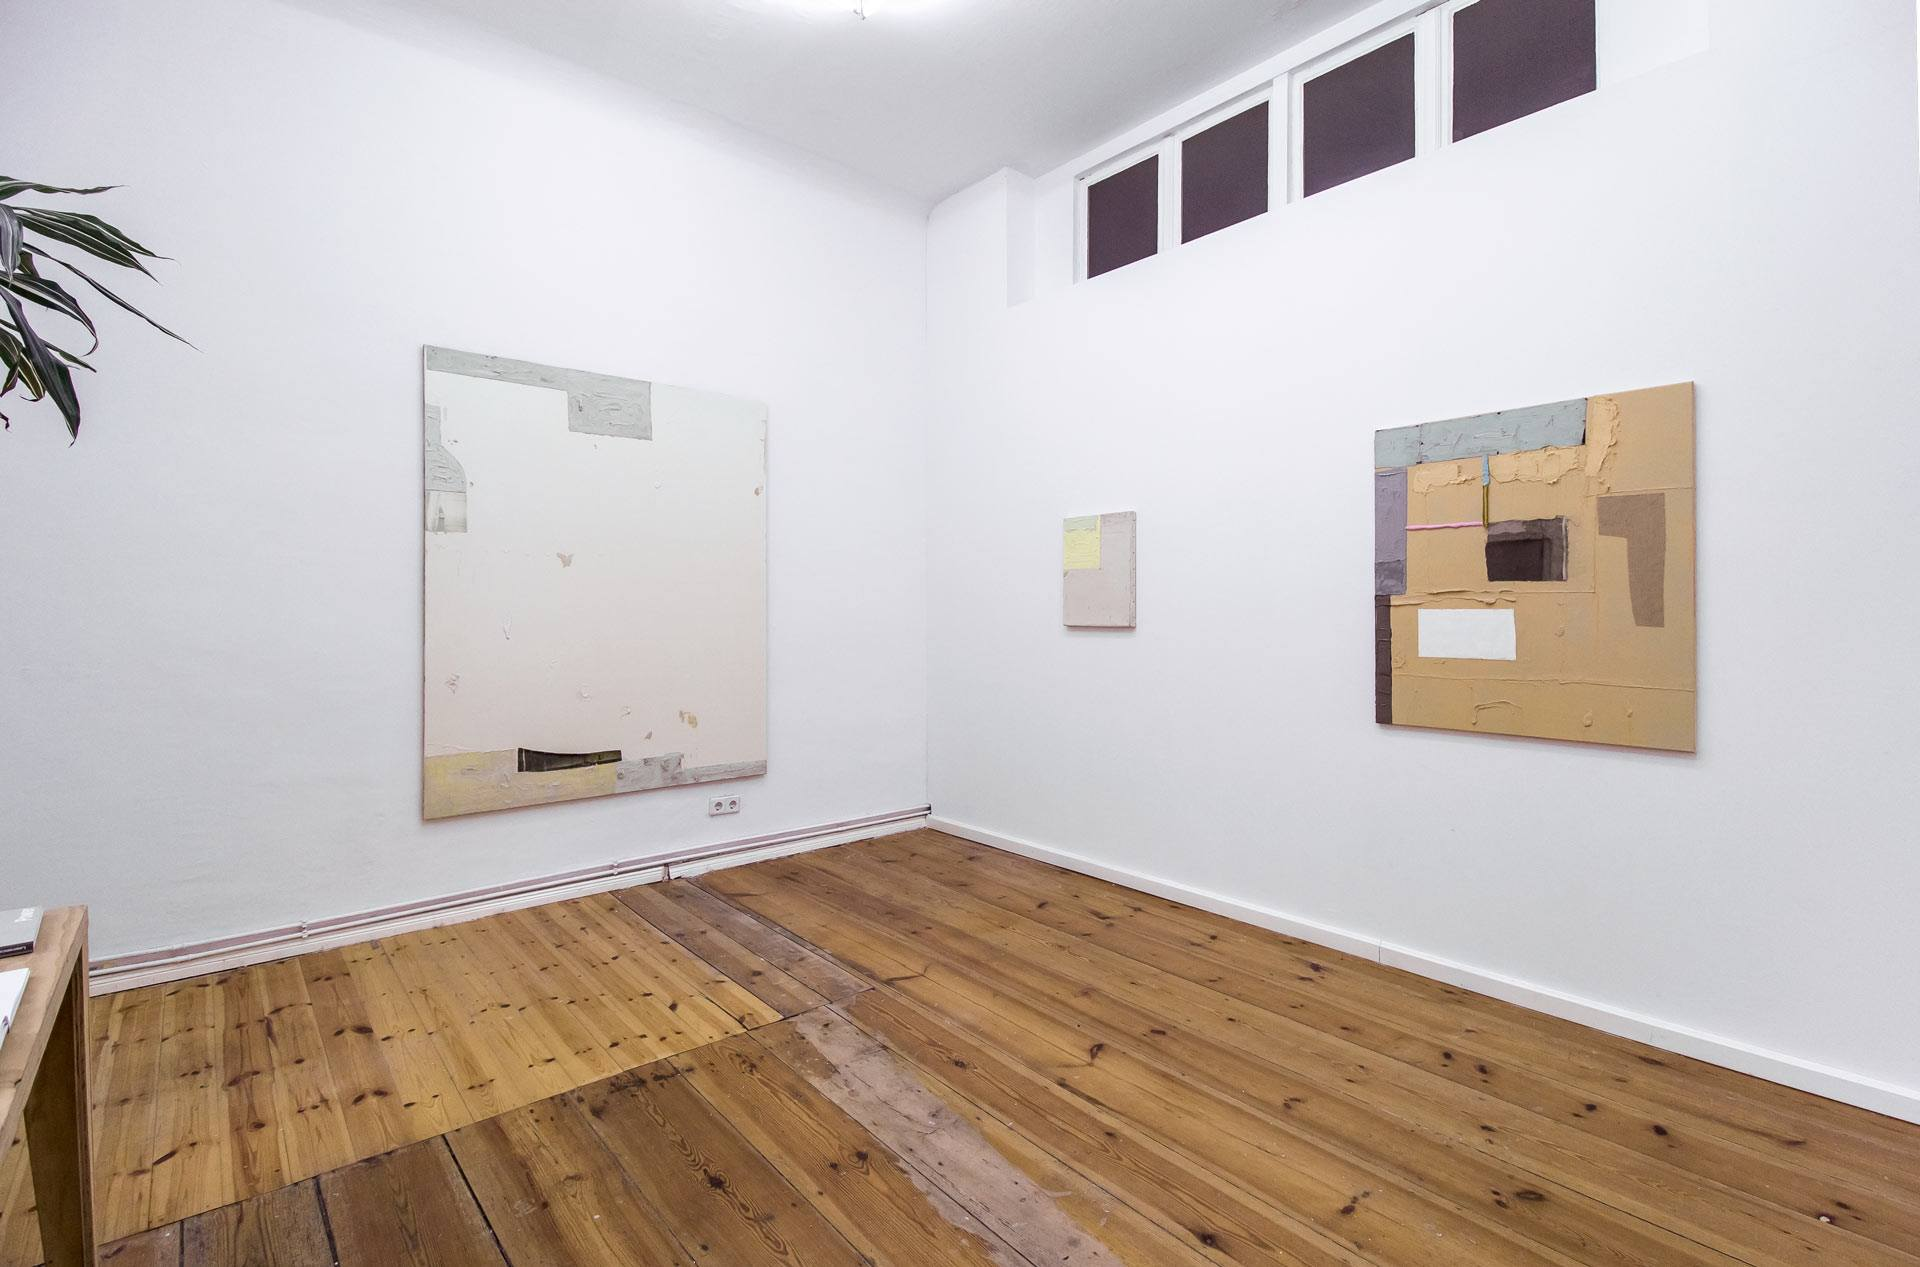 Lawrence Power, catalog, the landing strip, Berlin, 2017